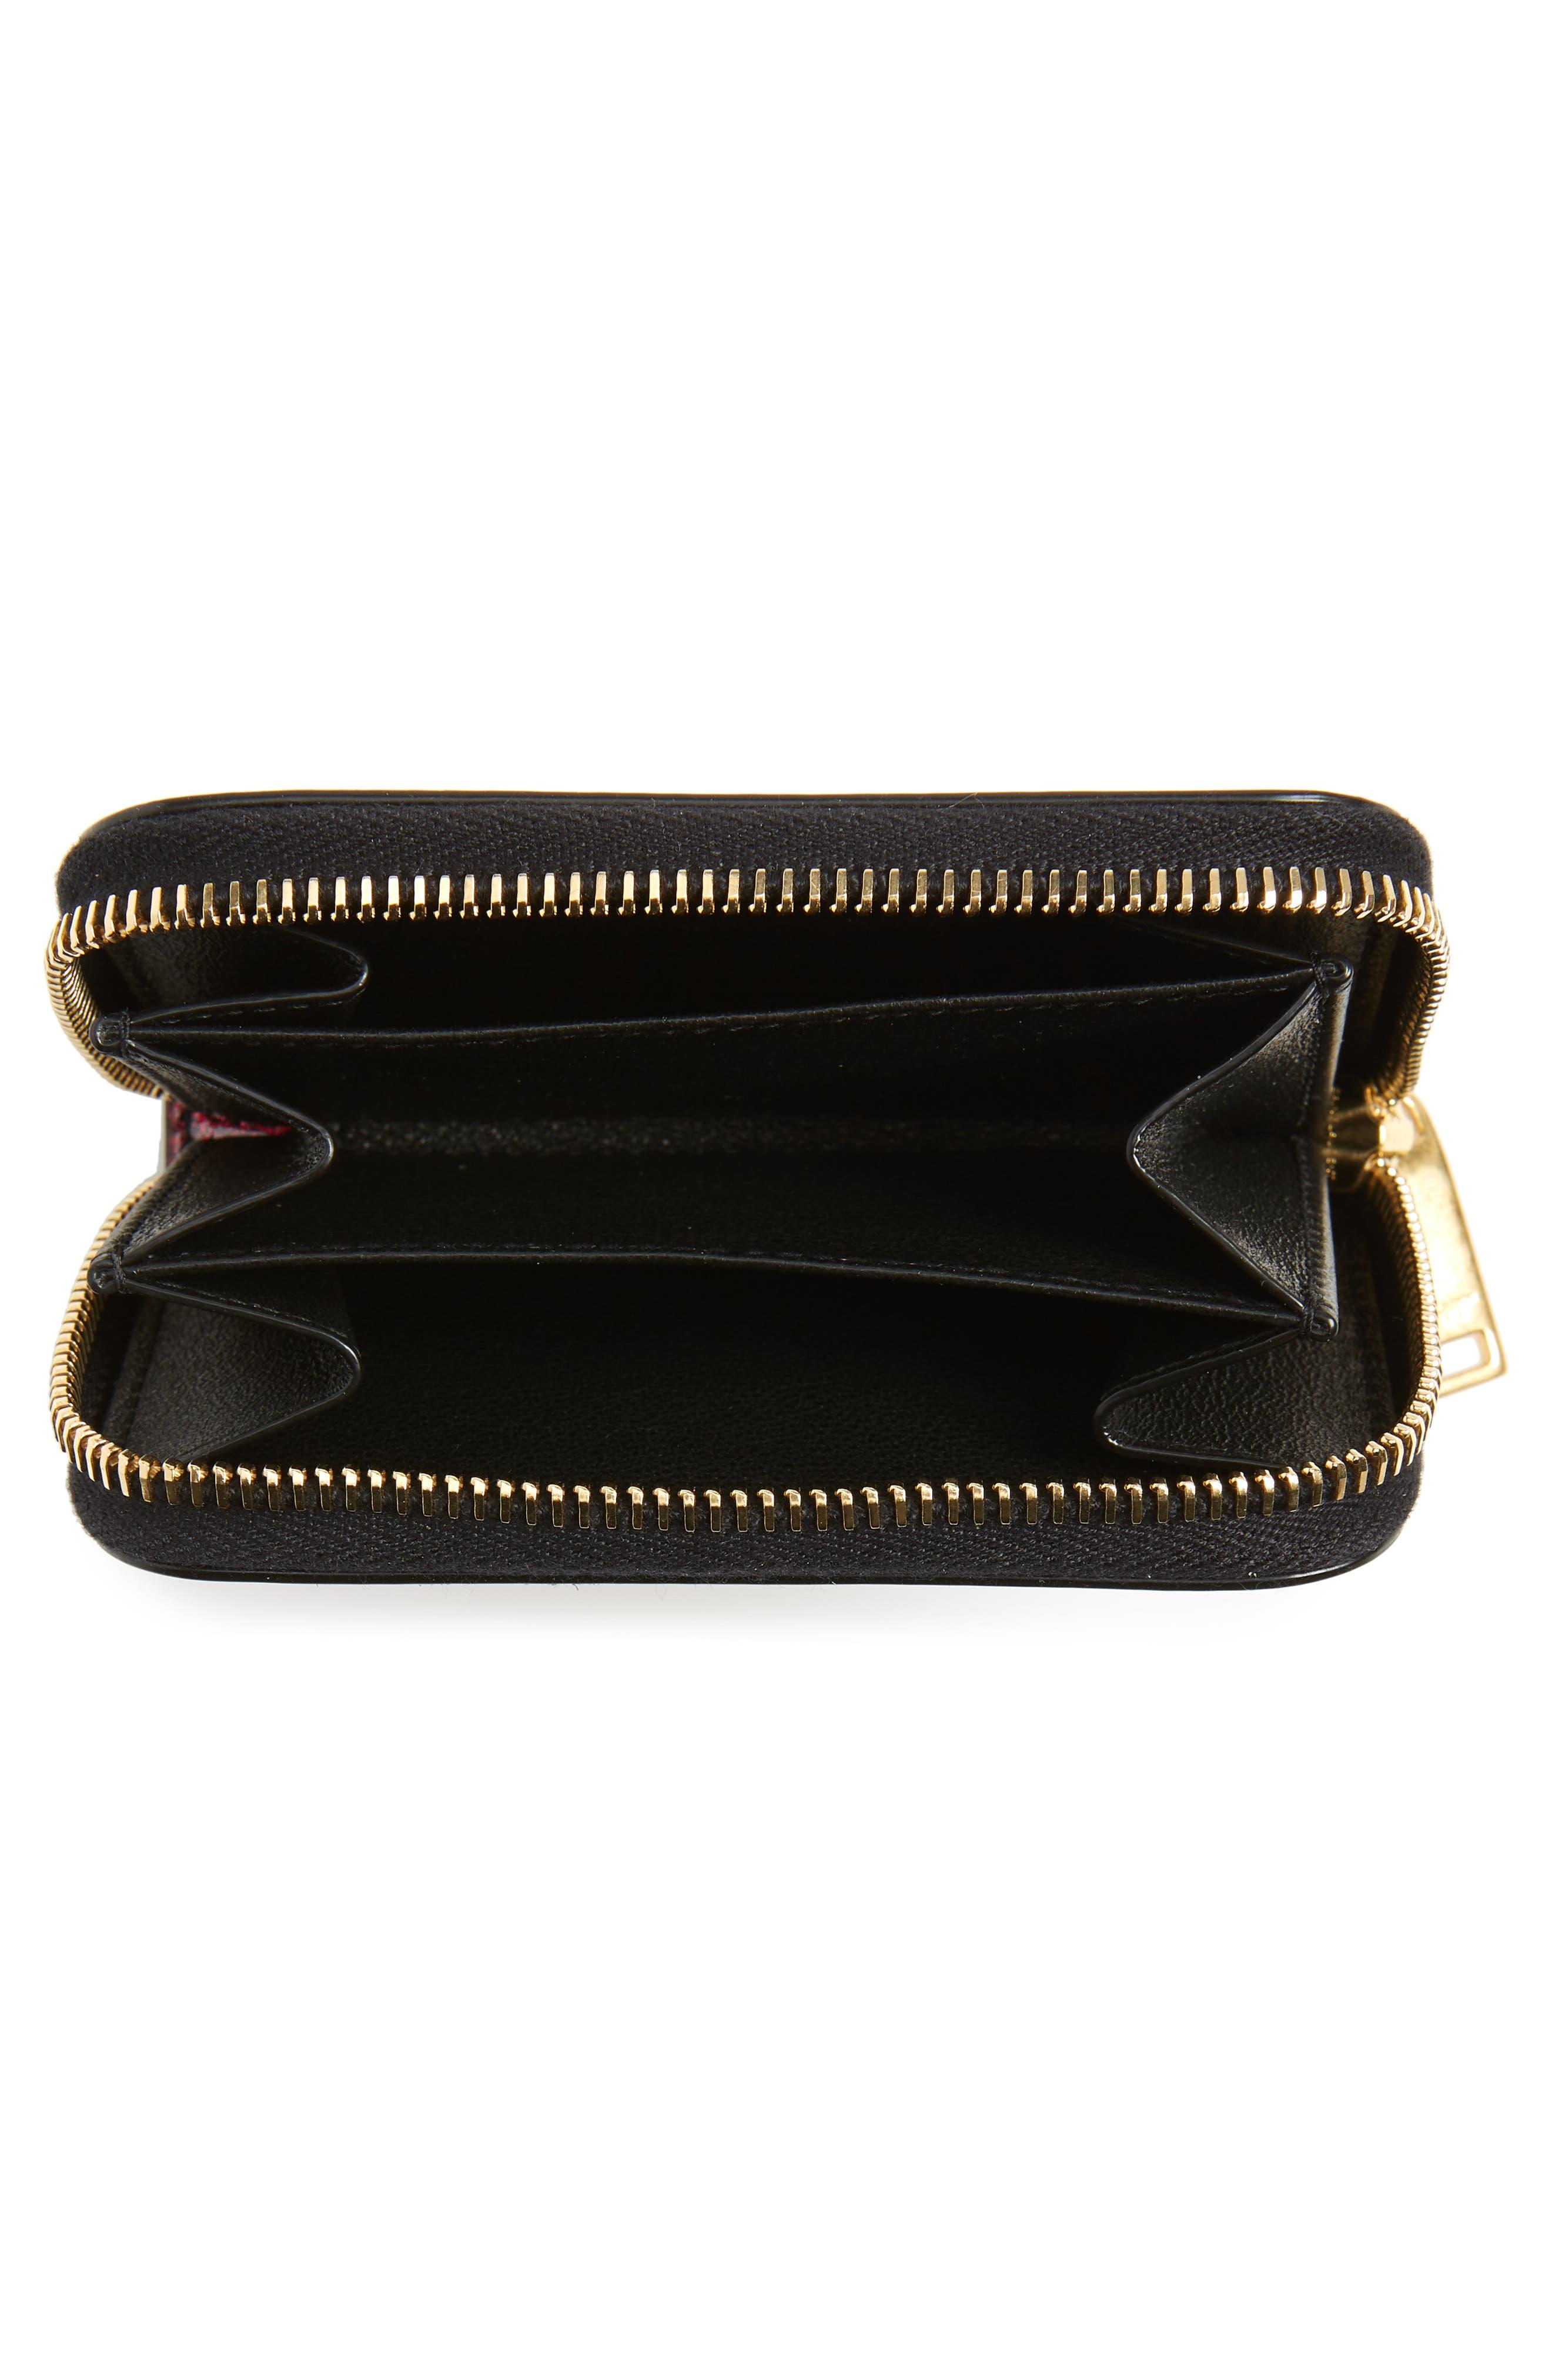 SAINT LAURENT, Glitter Calfskin Leather Wallet, Alternate thumbnail 2, color, SHOCKING PINK/ NOIR